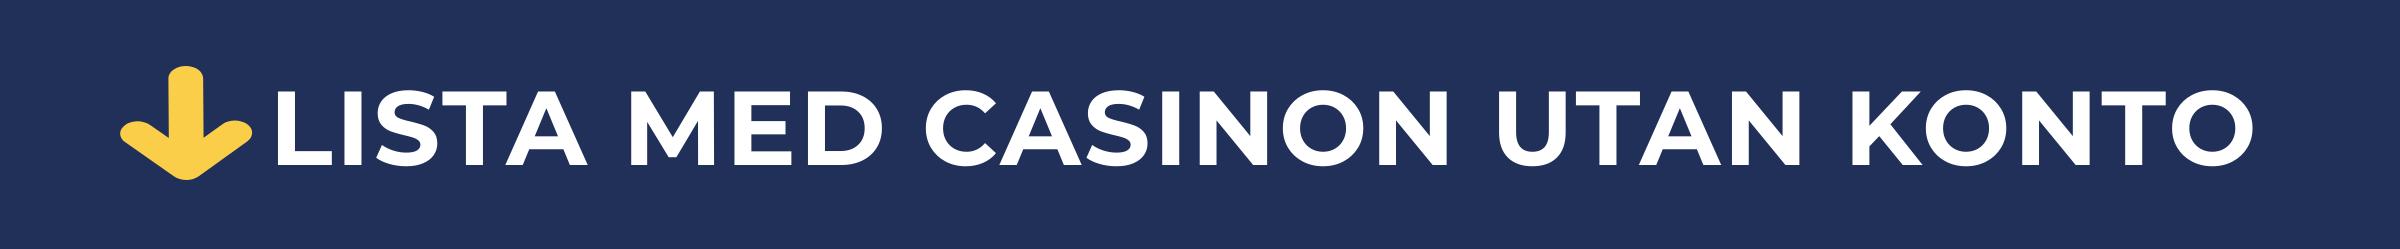 lista casino utan konto svensknatcasino se